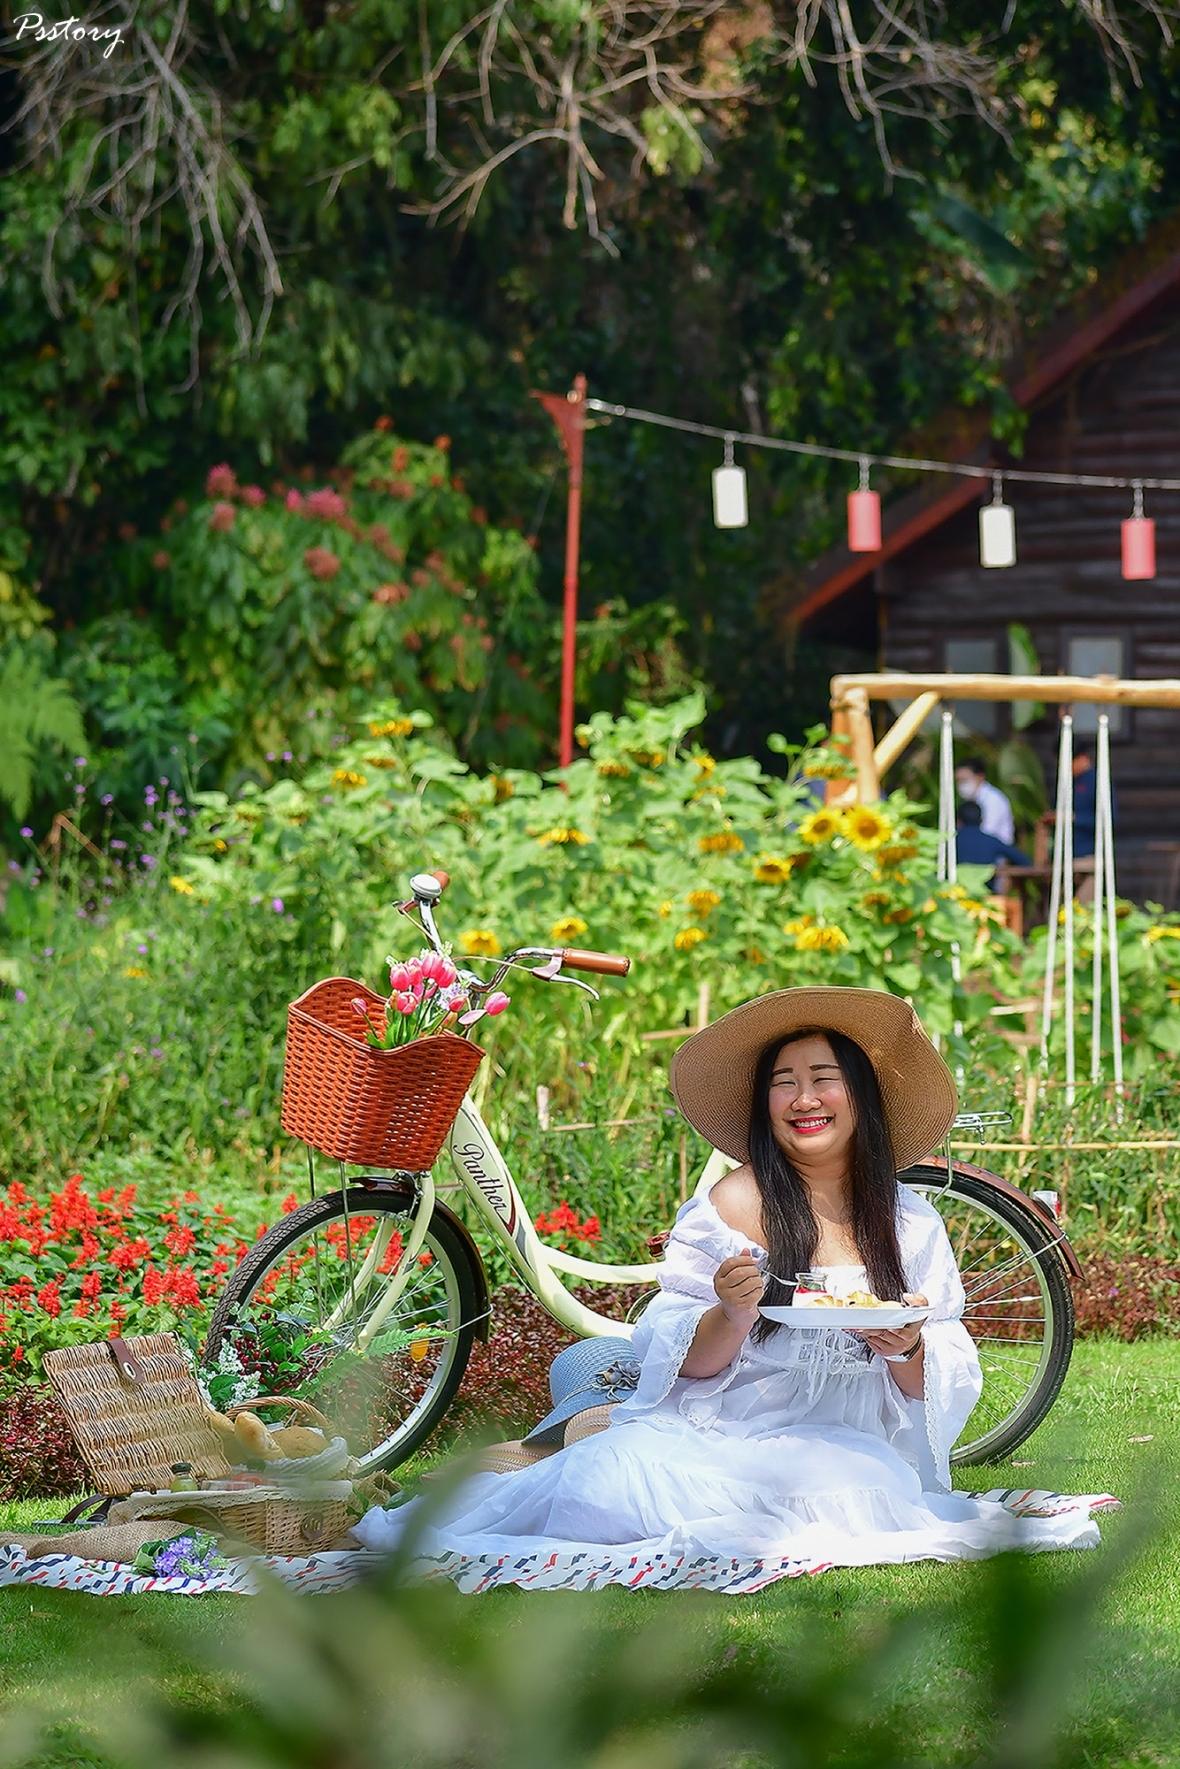 Flora Creek Chiang Mai (167)